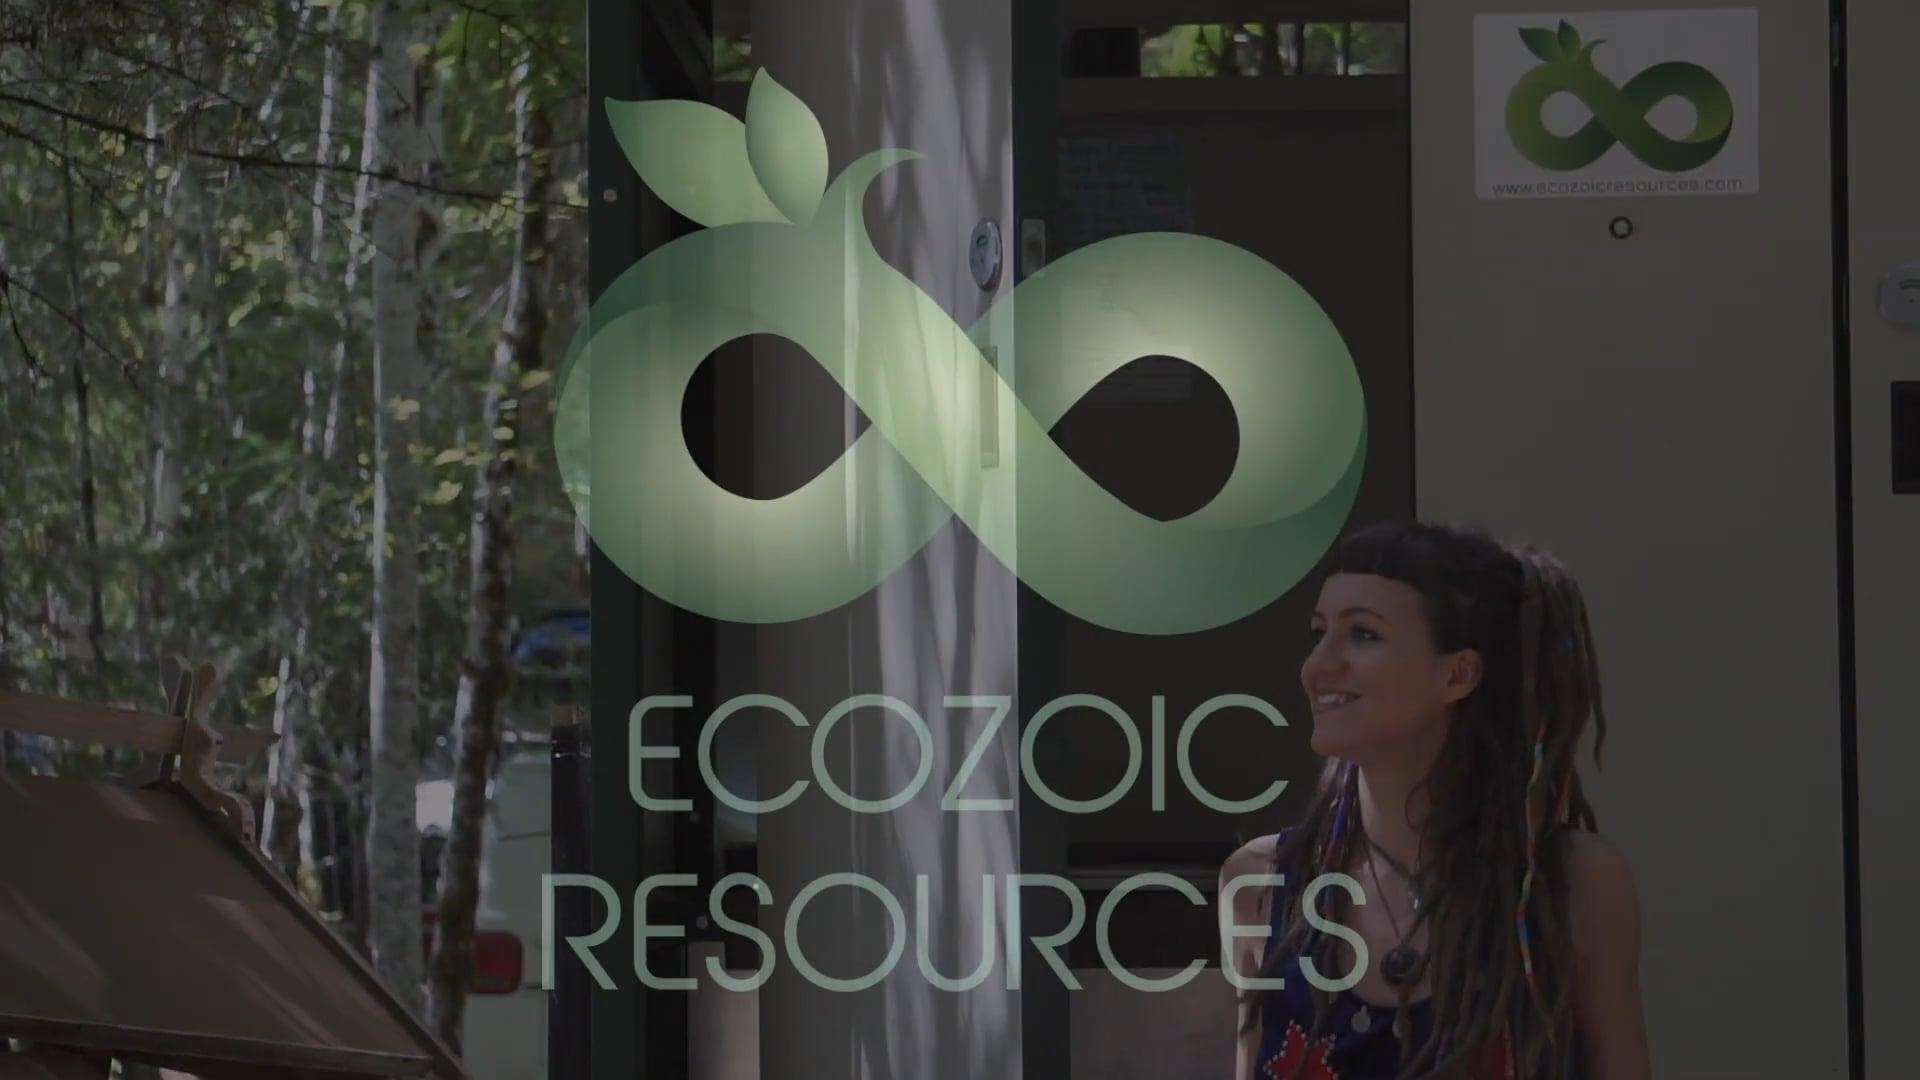 Ecozoic Toilets - Ad 2